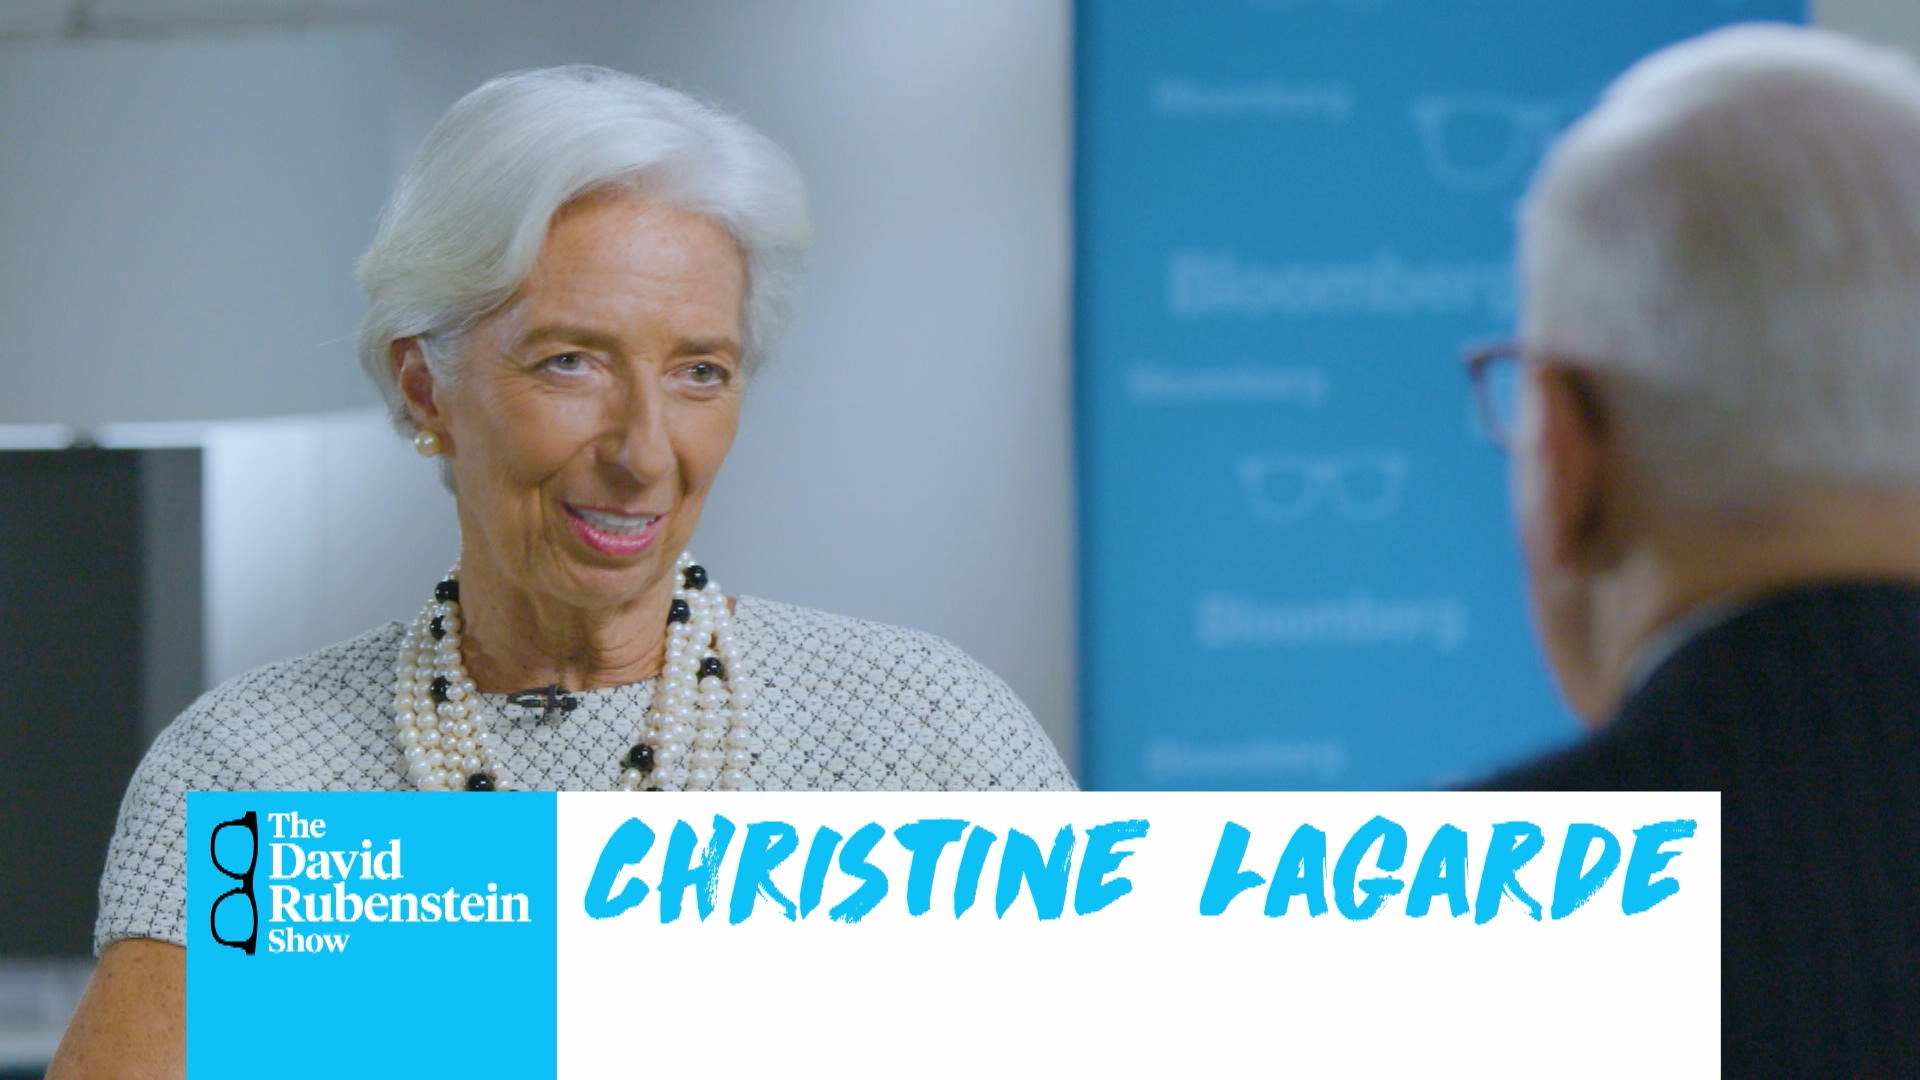 The David Rubenstein Show: Christine Lagarde - Bloomberg